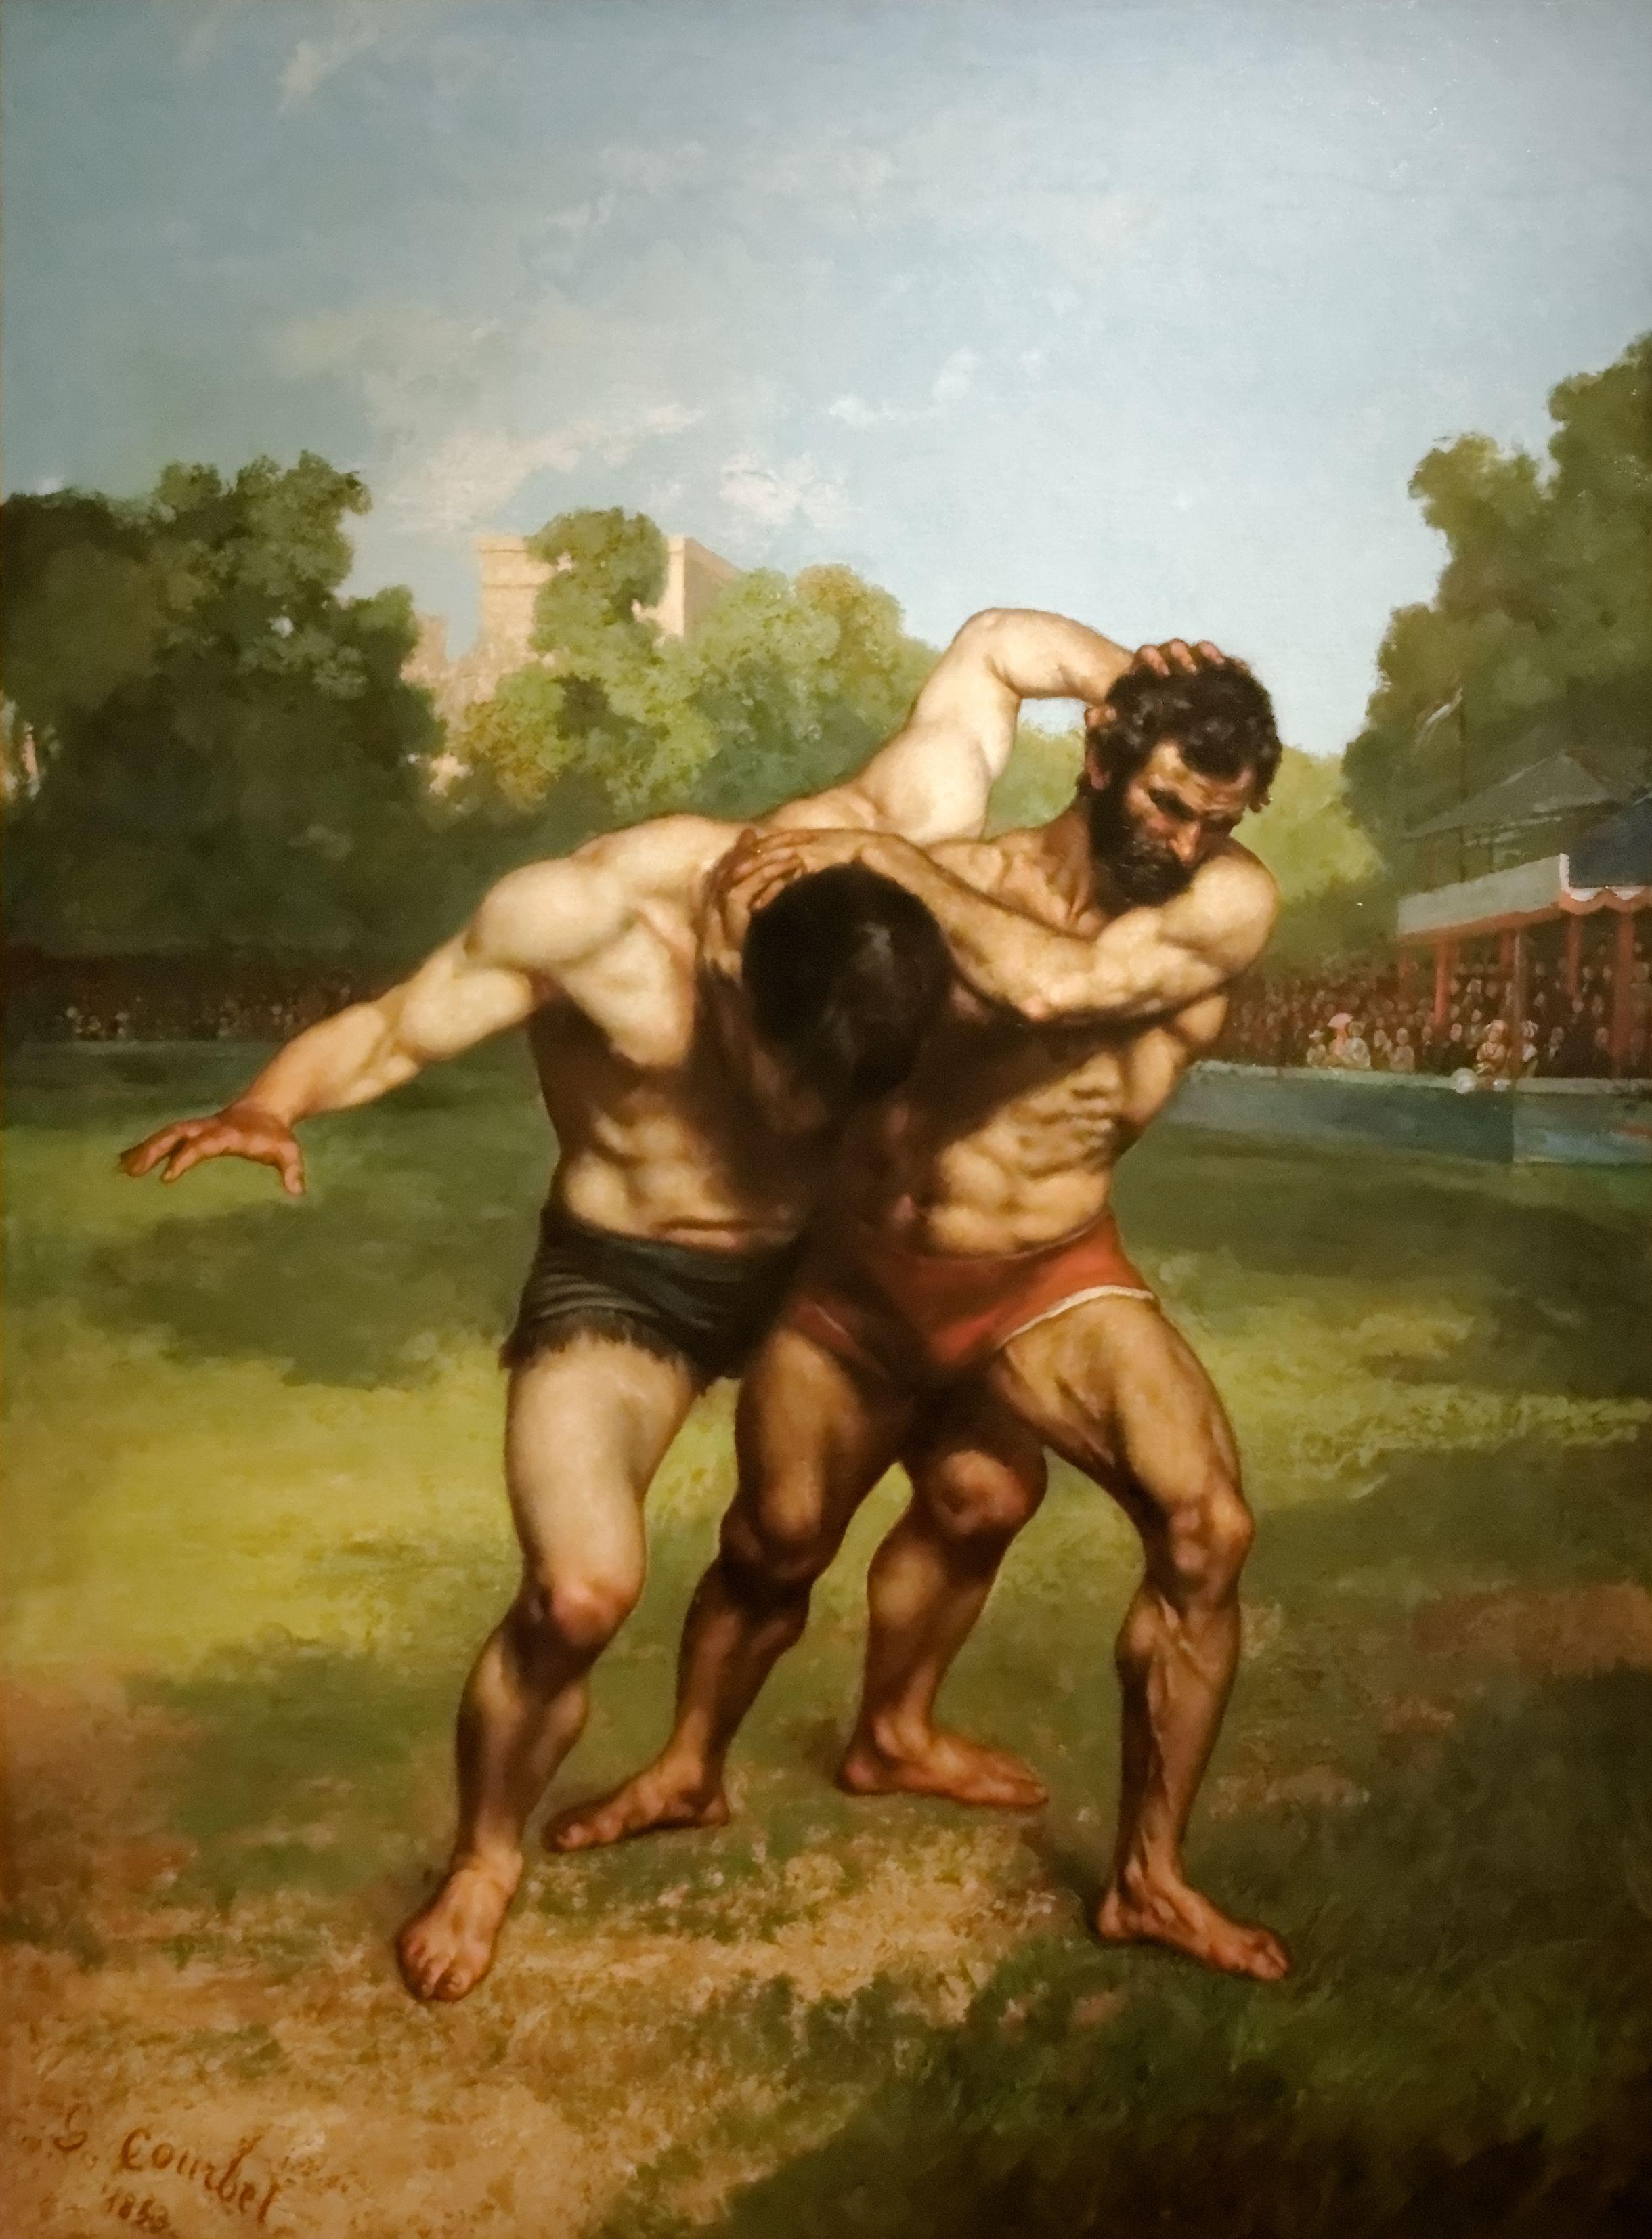 Gustave Courbet Les Lutteurs Kunstgeschichte Öl Auf Leinwand Gemälde